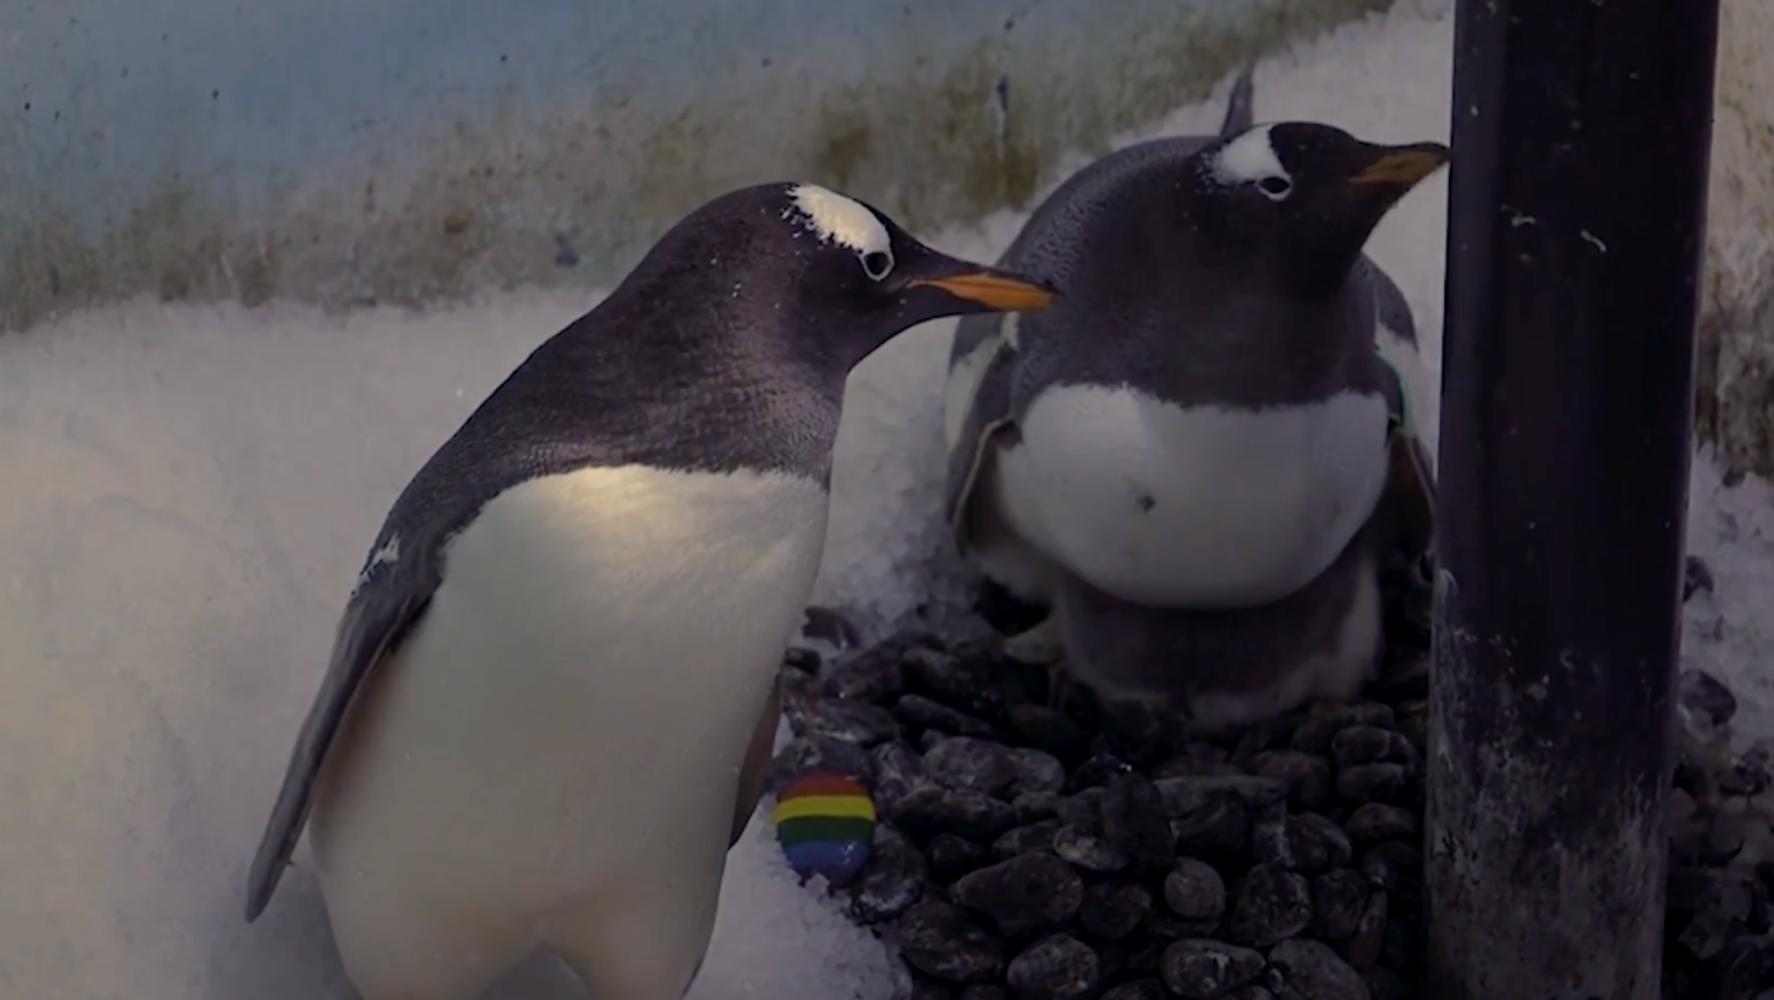 London's Same-Sex Penguin Couple Are Set To Raise 'Genderless' Chick